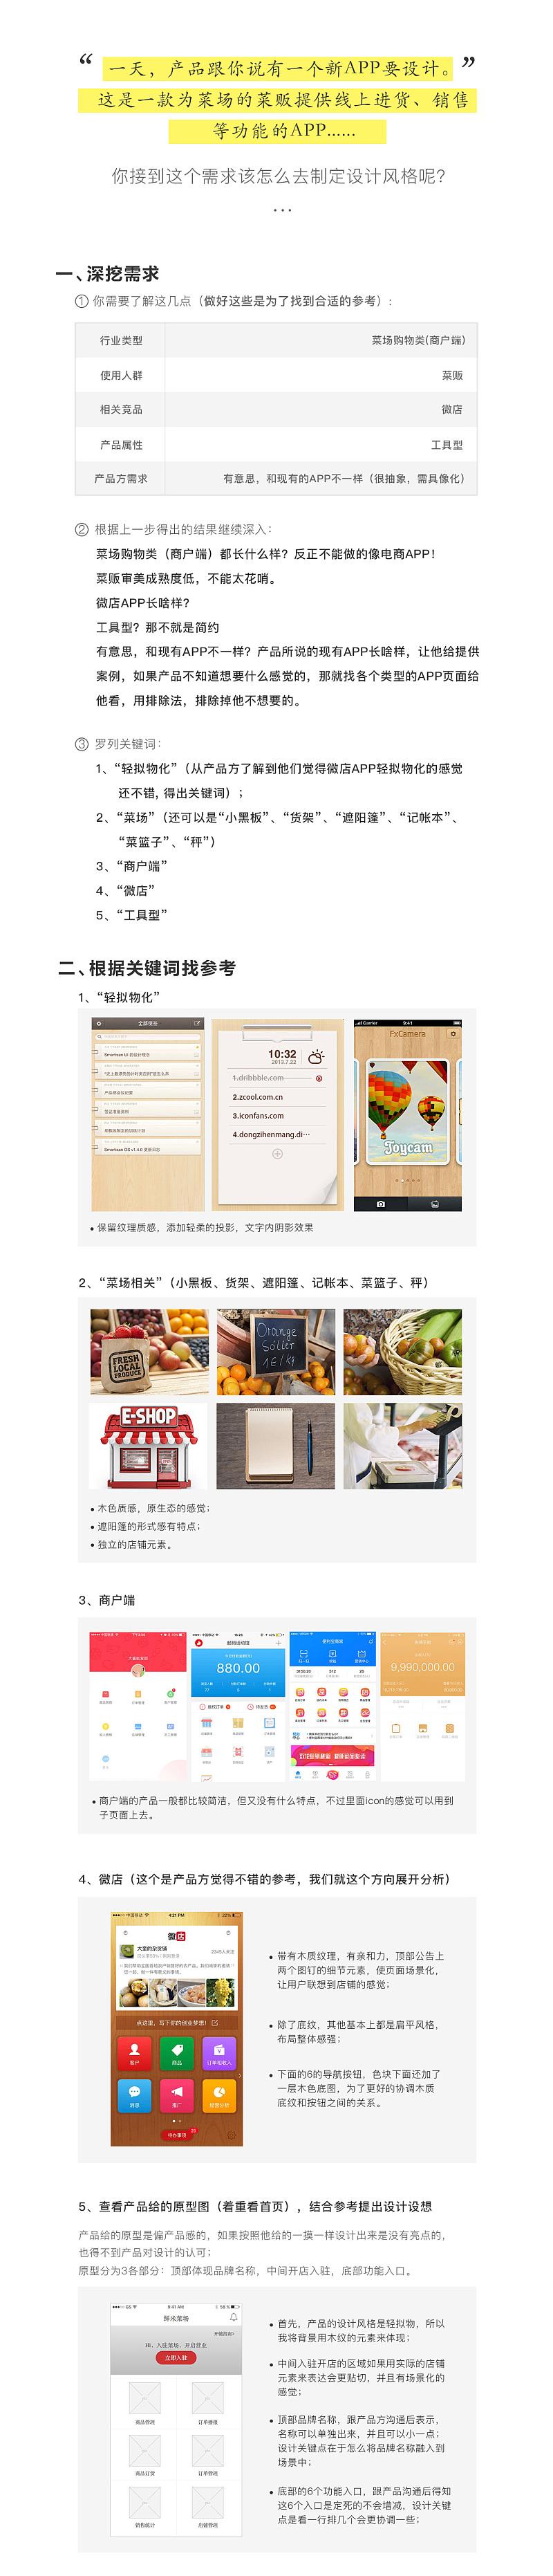 app详细UI设计过程